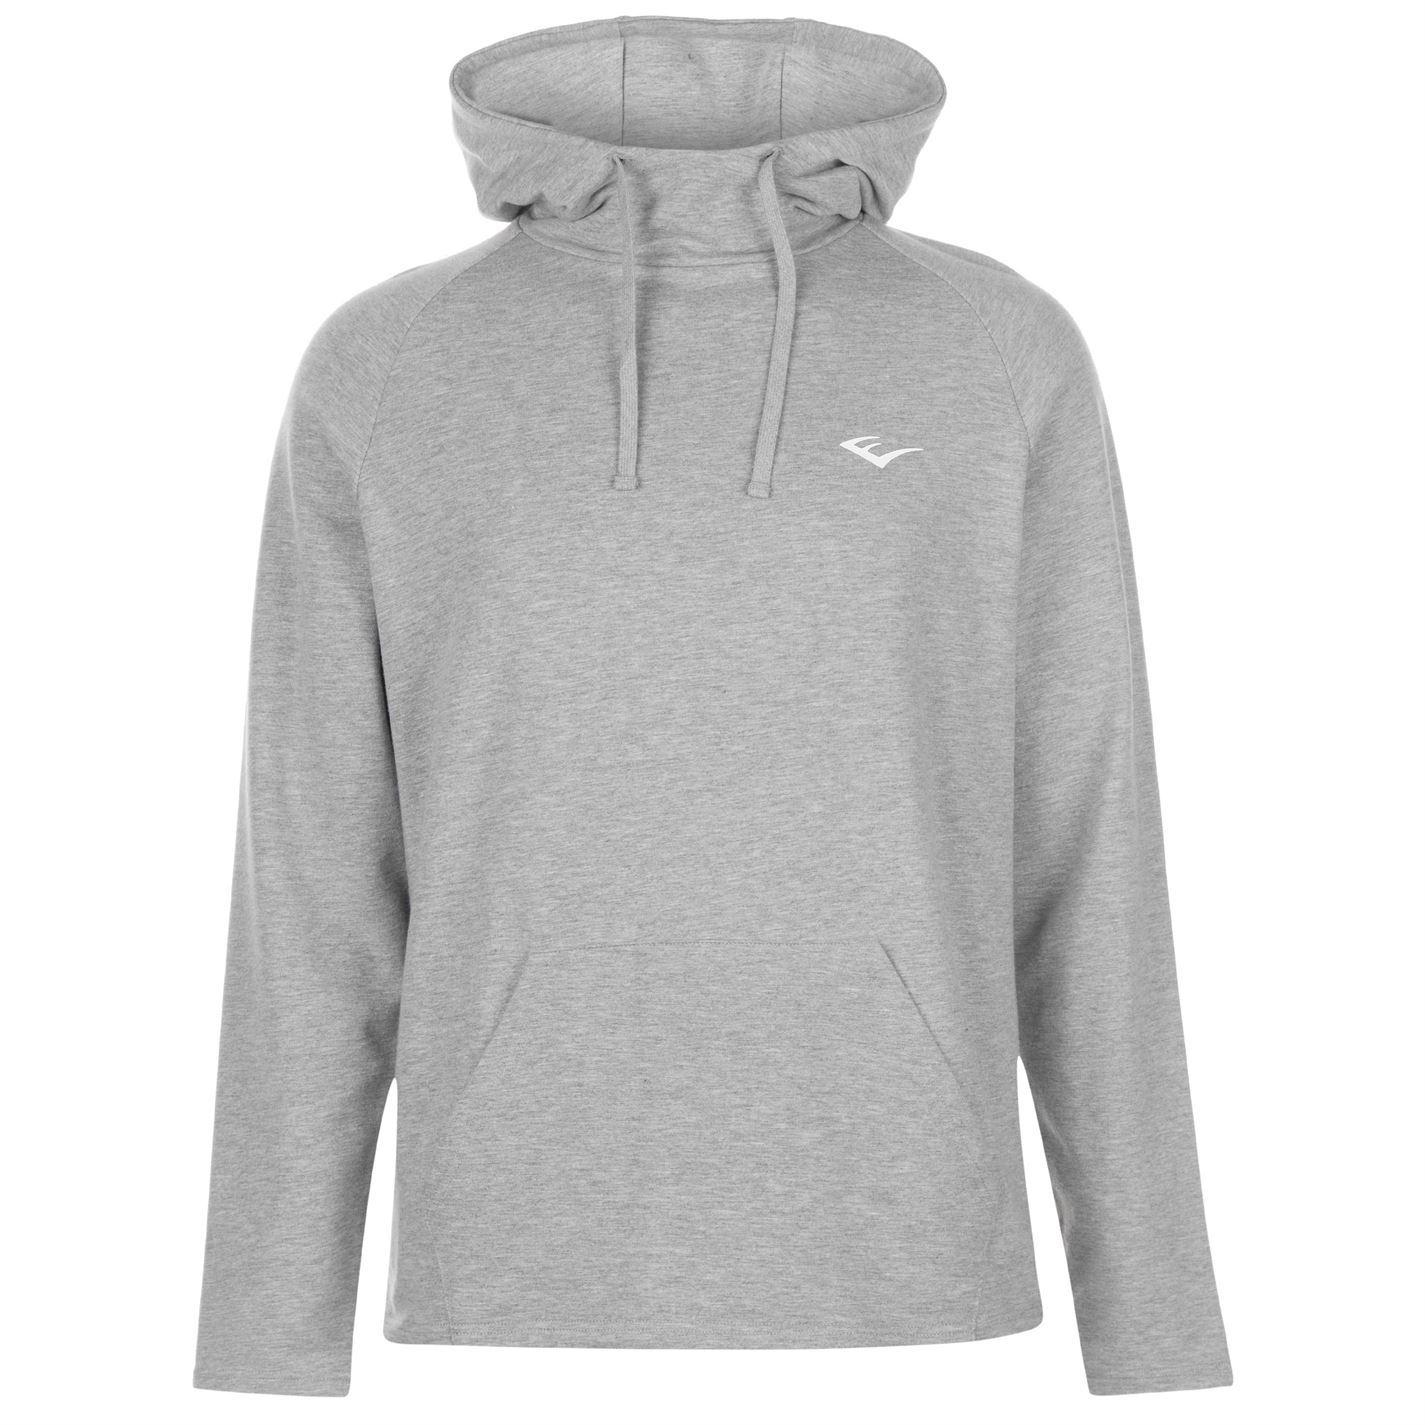 Oth Pullover Logo Everlast Sweater Sweatshirt Hoody Hoodie Mens p5I8wx8